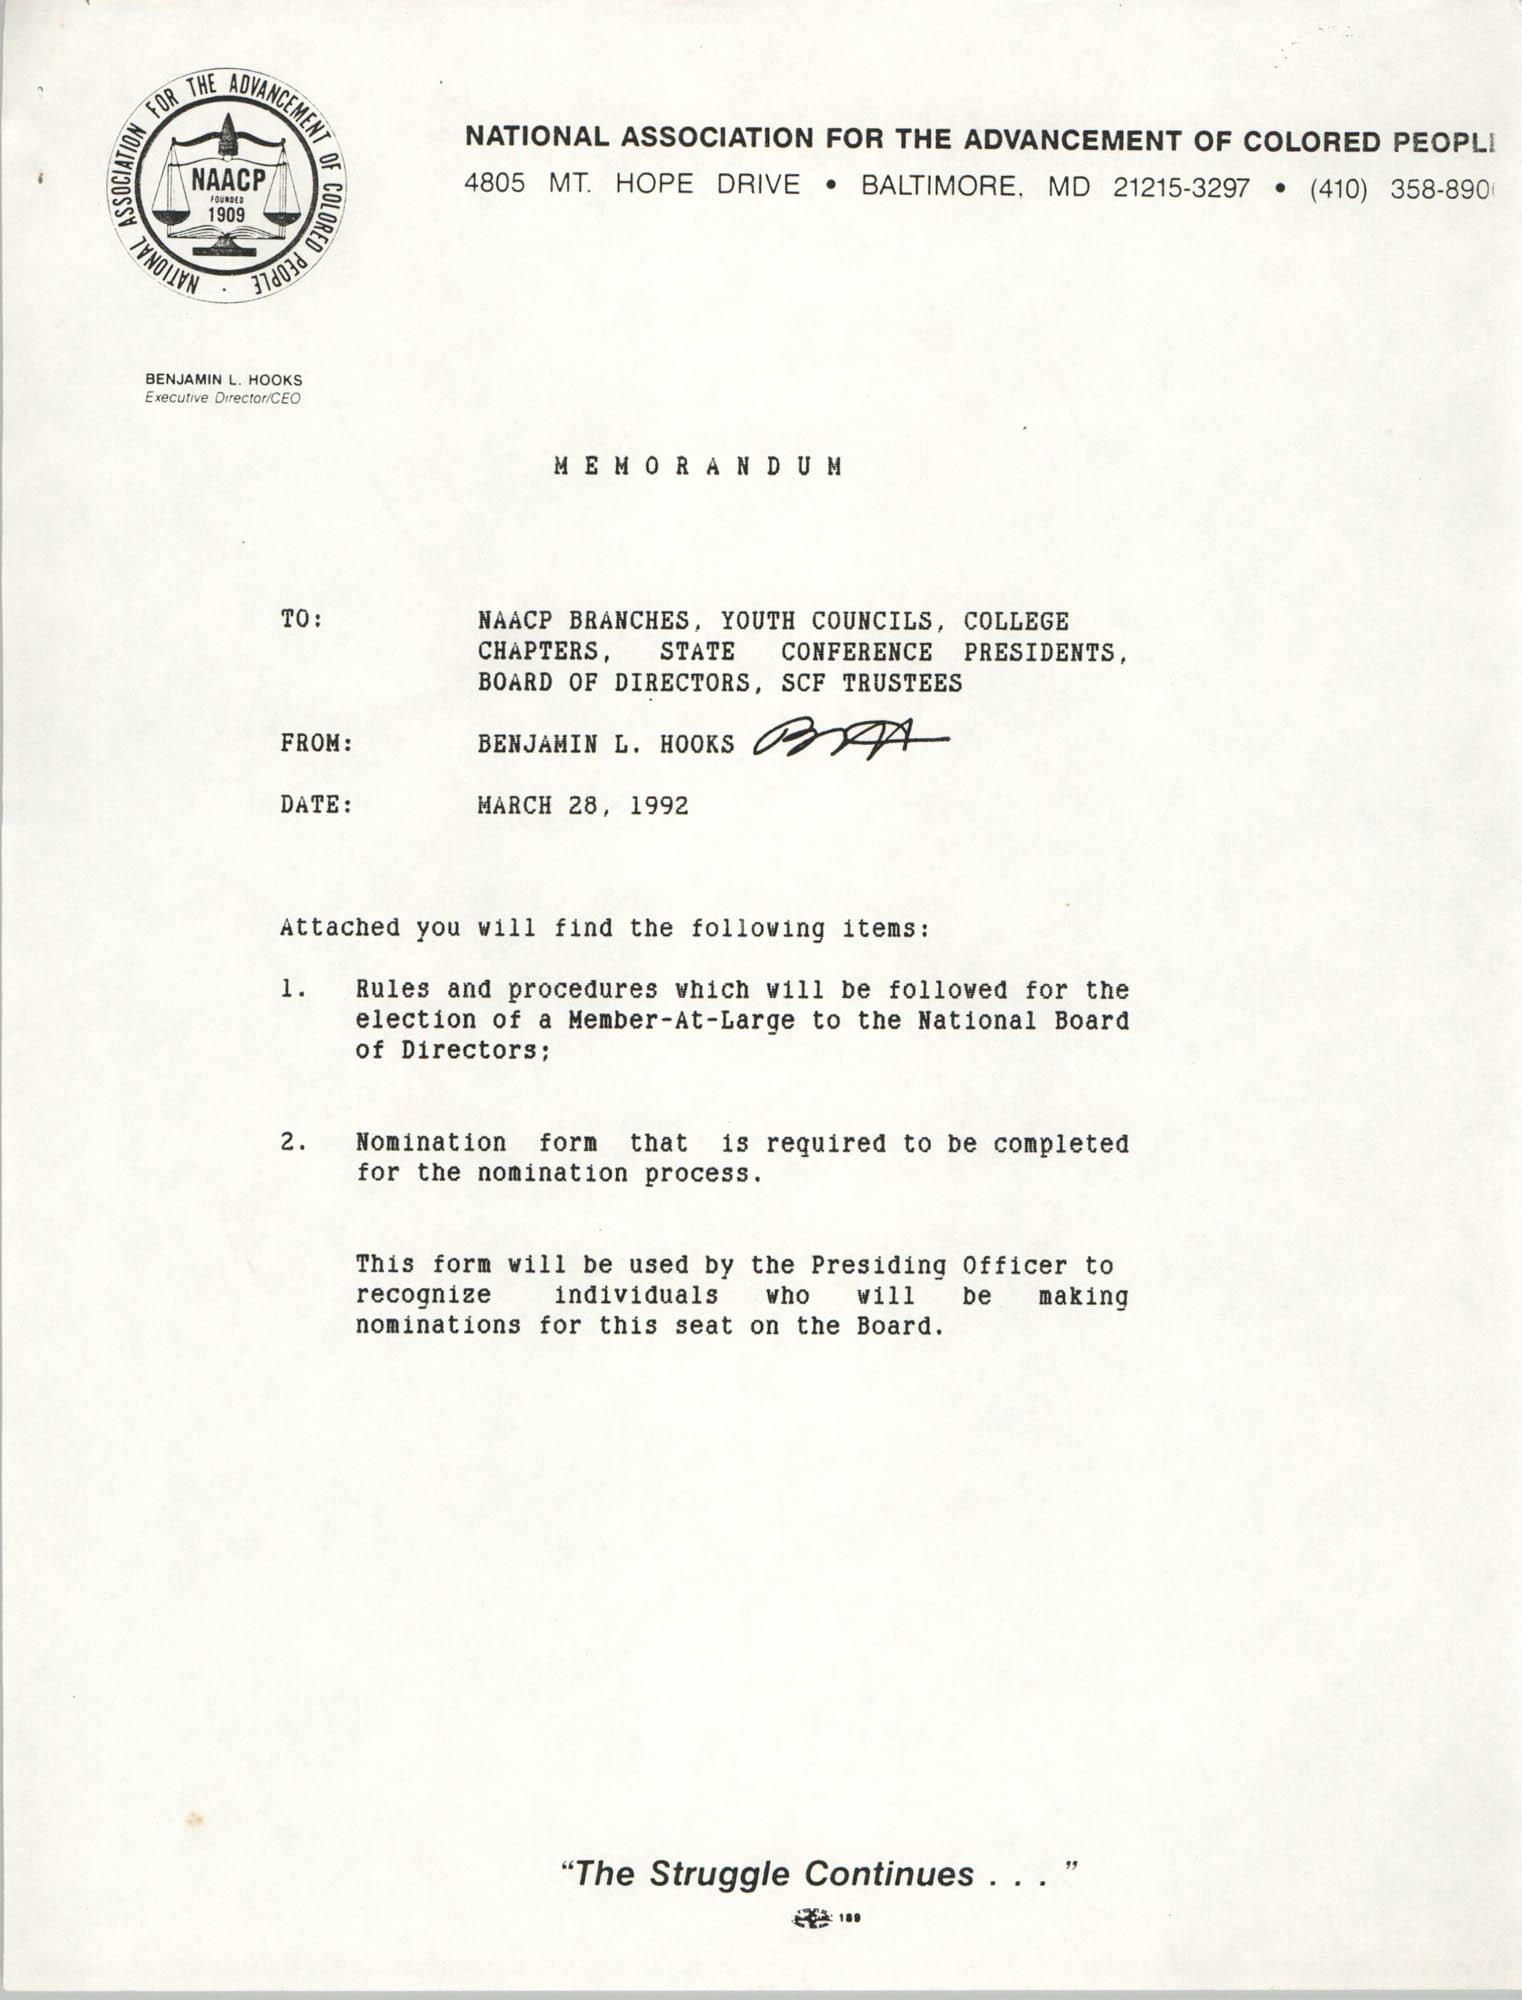 NAACP Memorandum, March 28, 1992